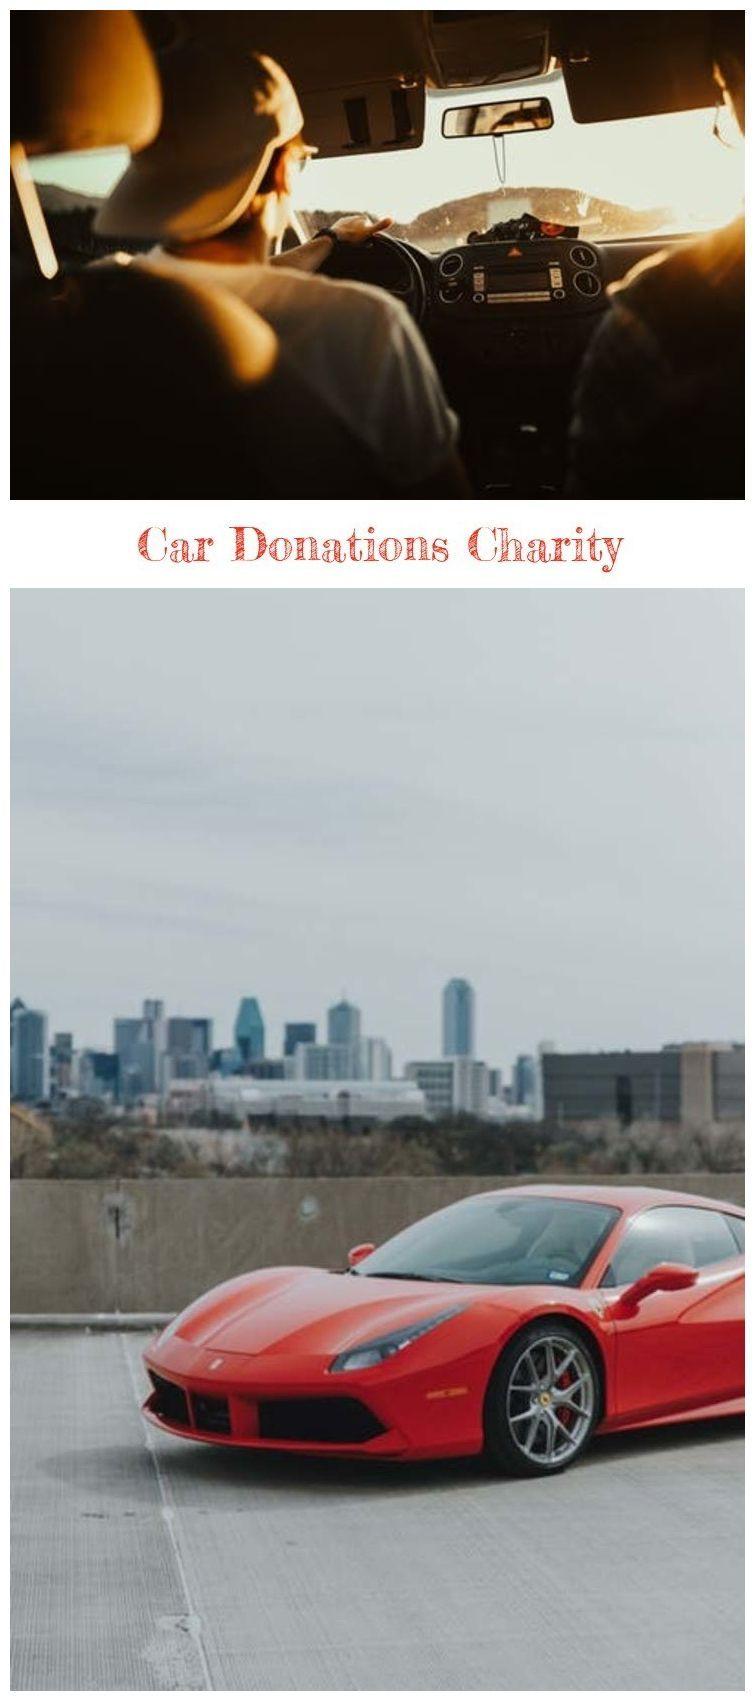 Enterprise Rent A Car Donations Enterprise Rent A Car Rent A Car Car